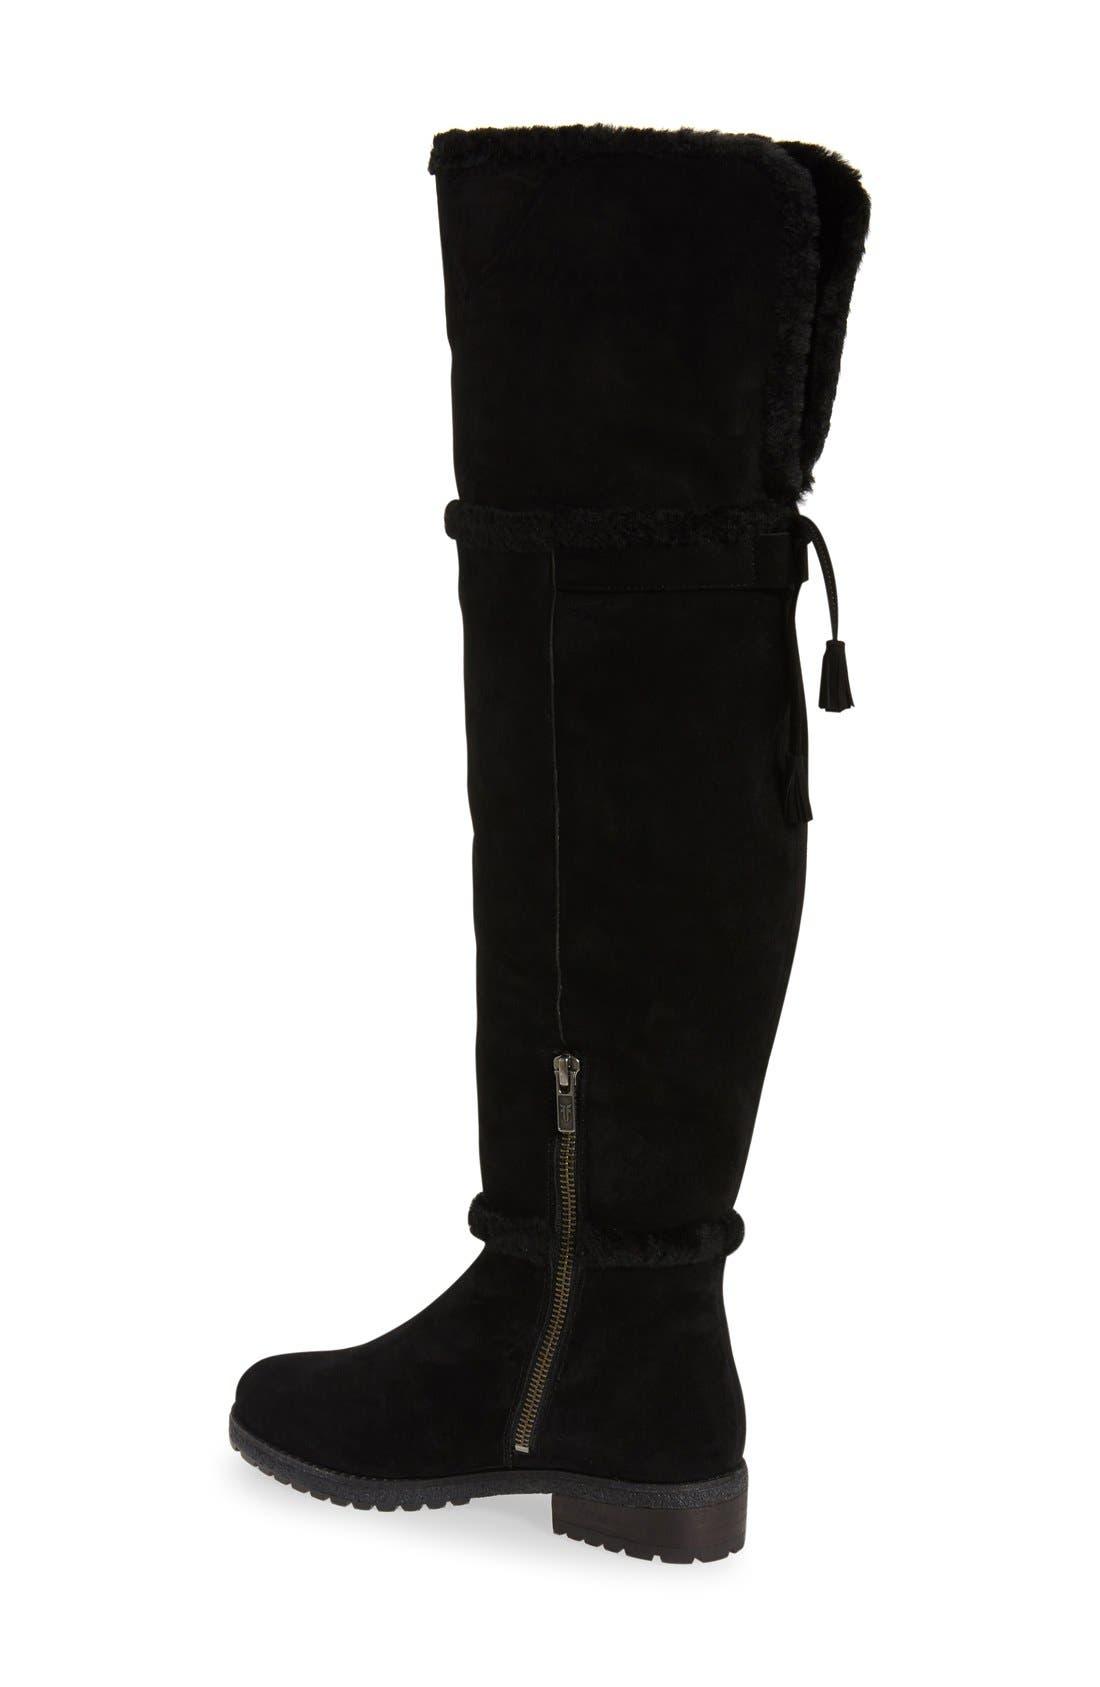 Alternate Image 2  - Frye 'Tamara' Genuine Shearling Over the Knee Boot (Women)